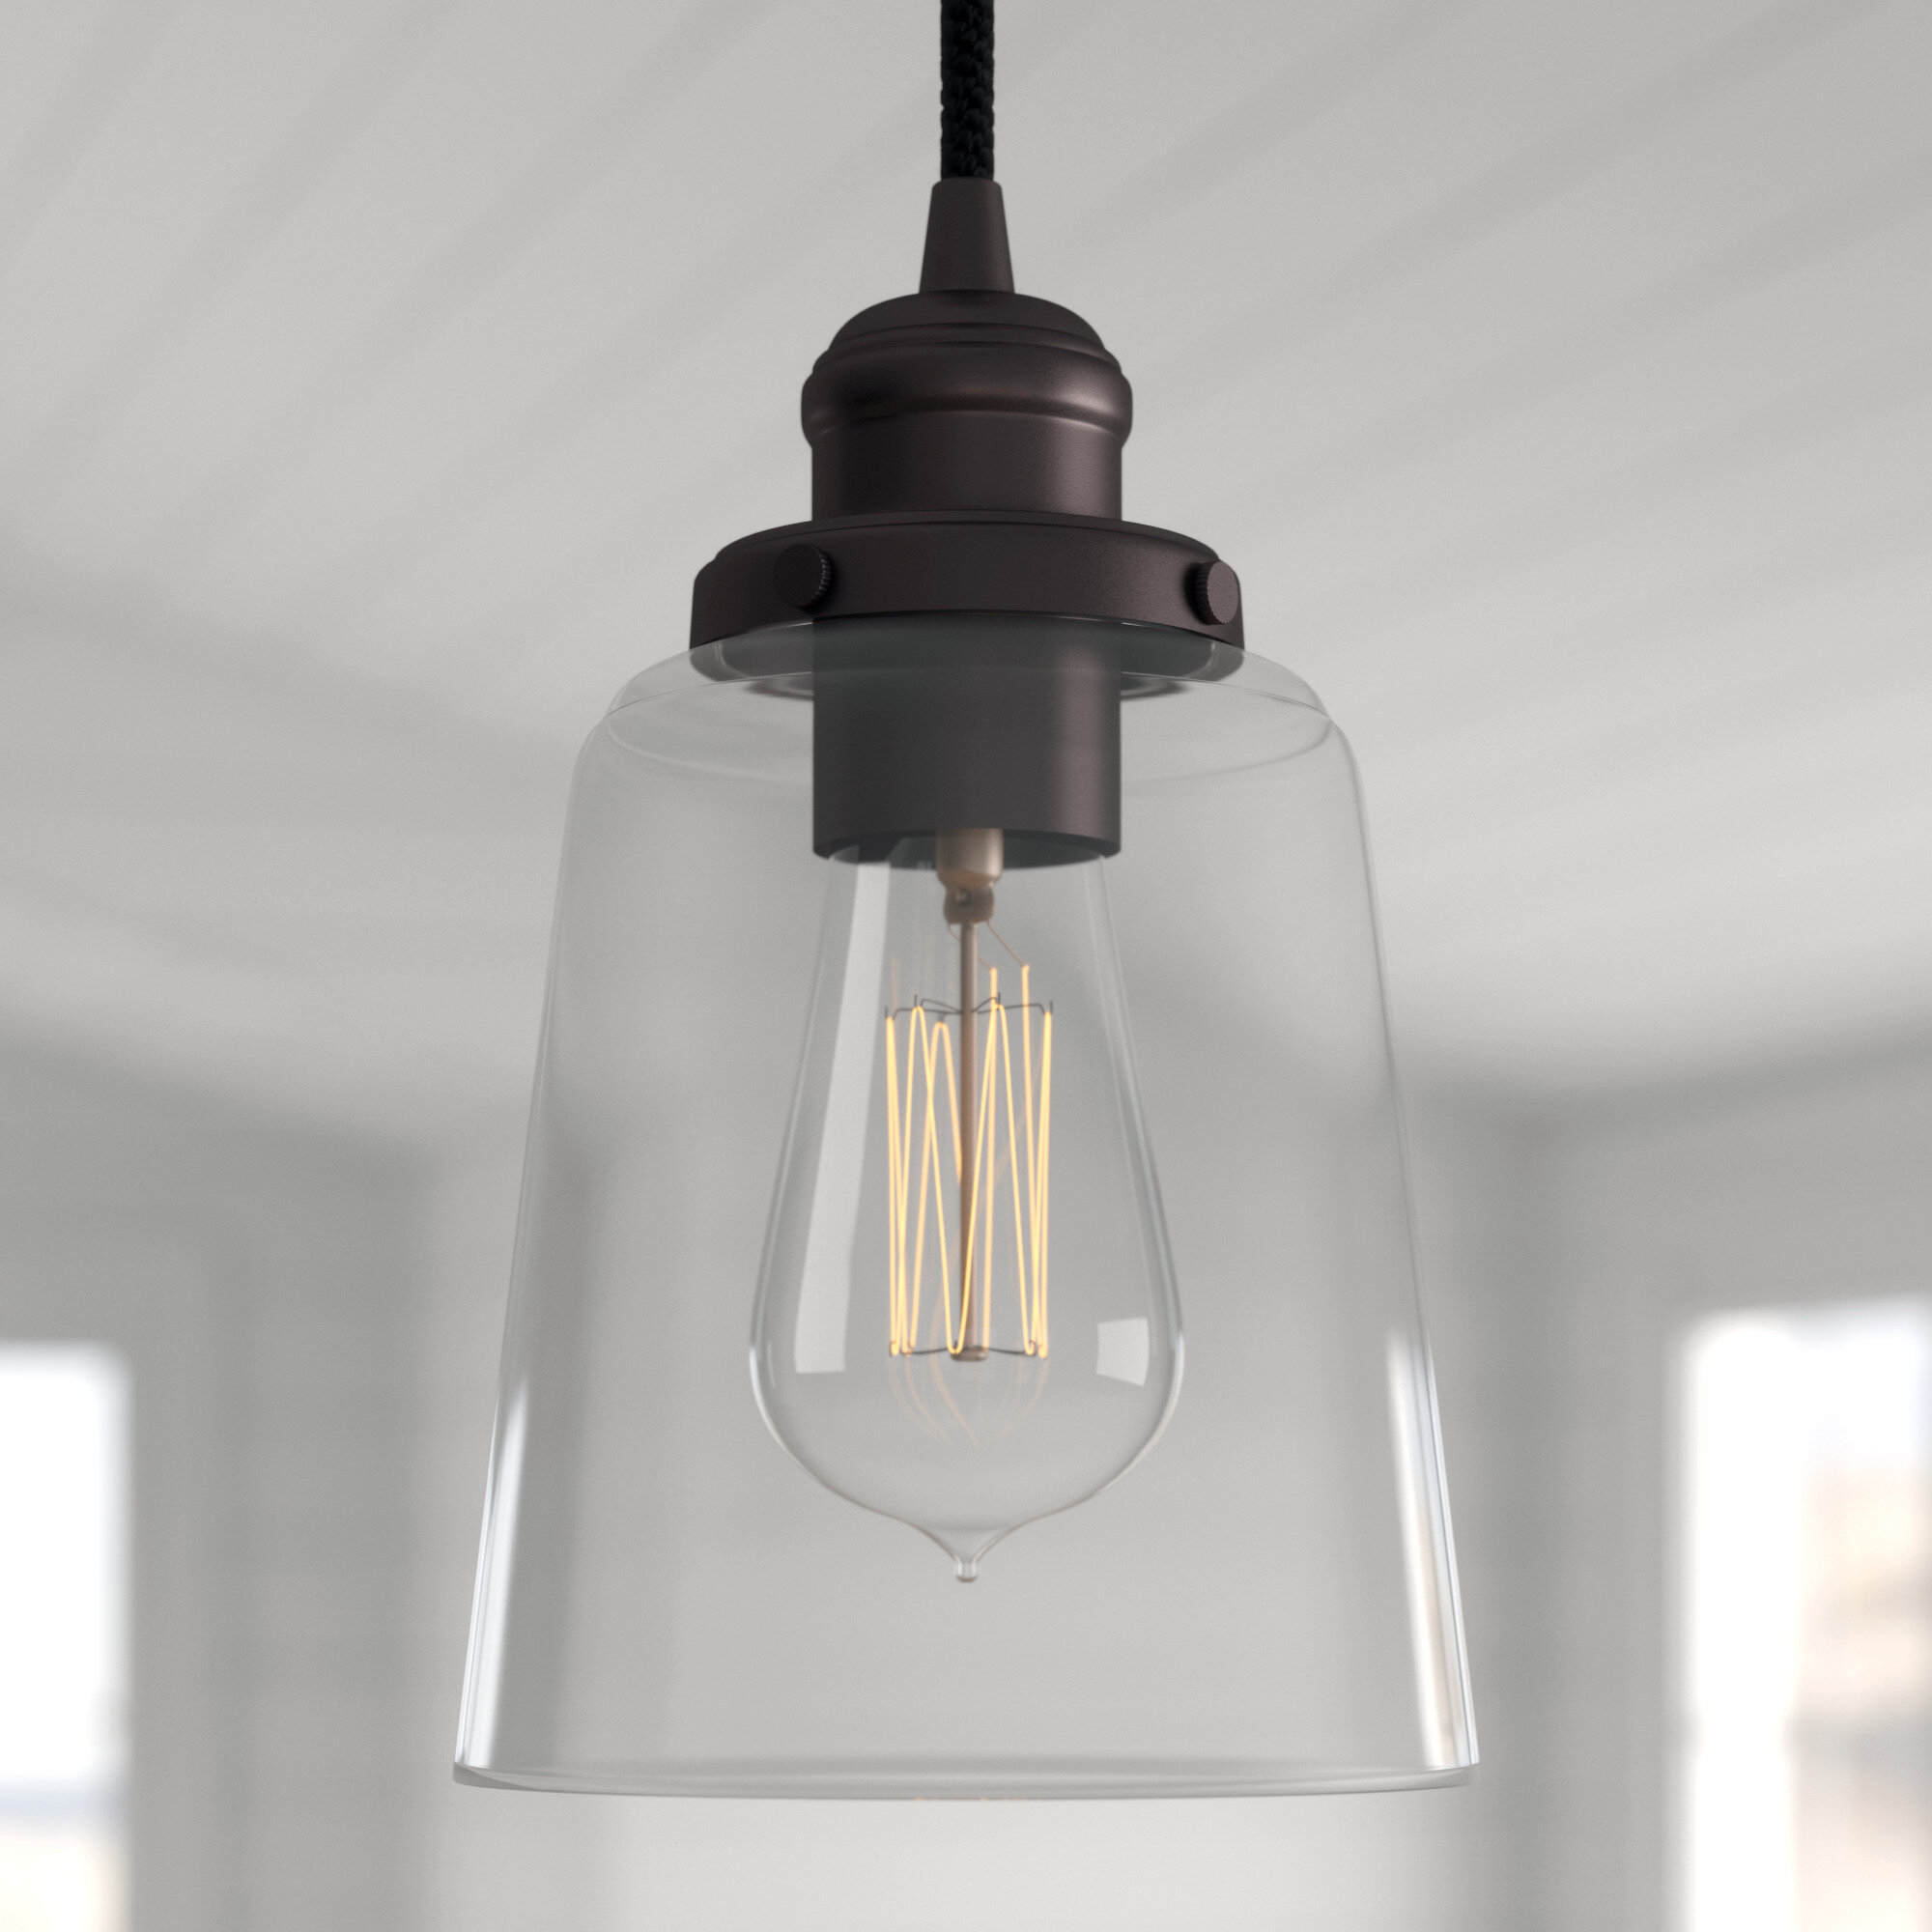 1 Light Cone Pendant Regarding Cinchring 1 Light Cone Pendants (View 1 of 30)